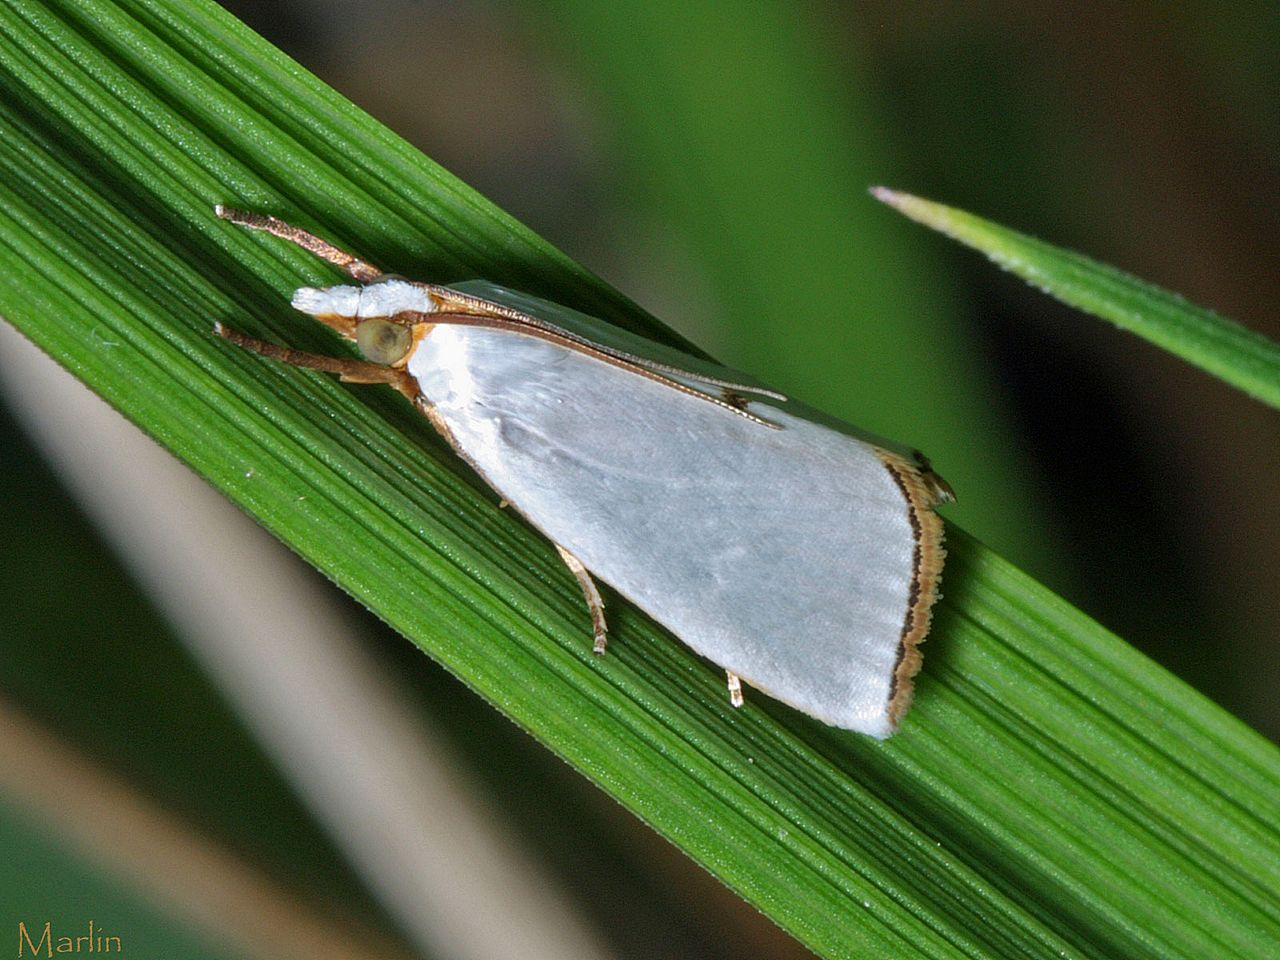 Snowy Urola Moth - Urola nivalis